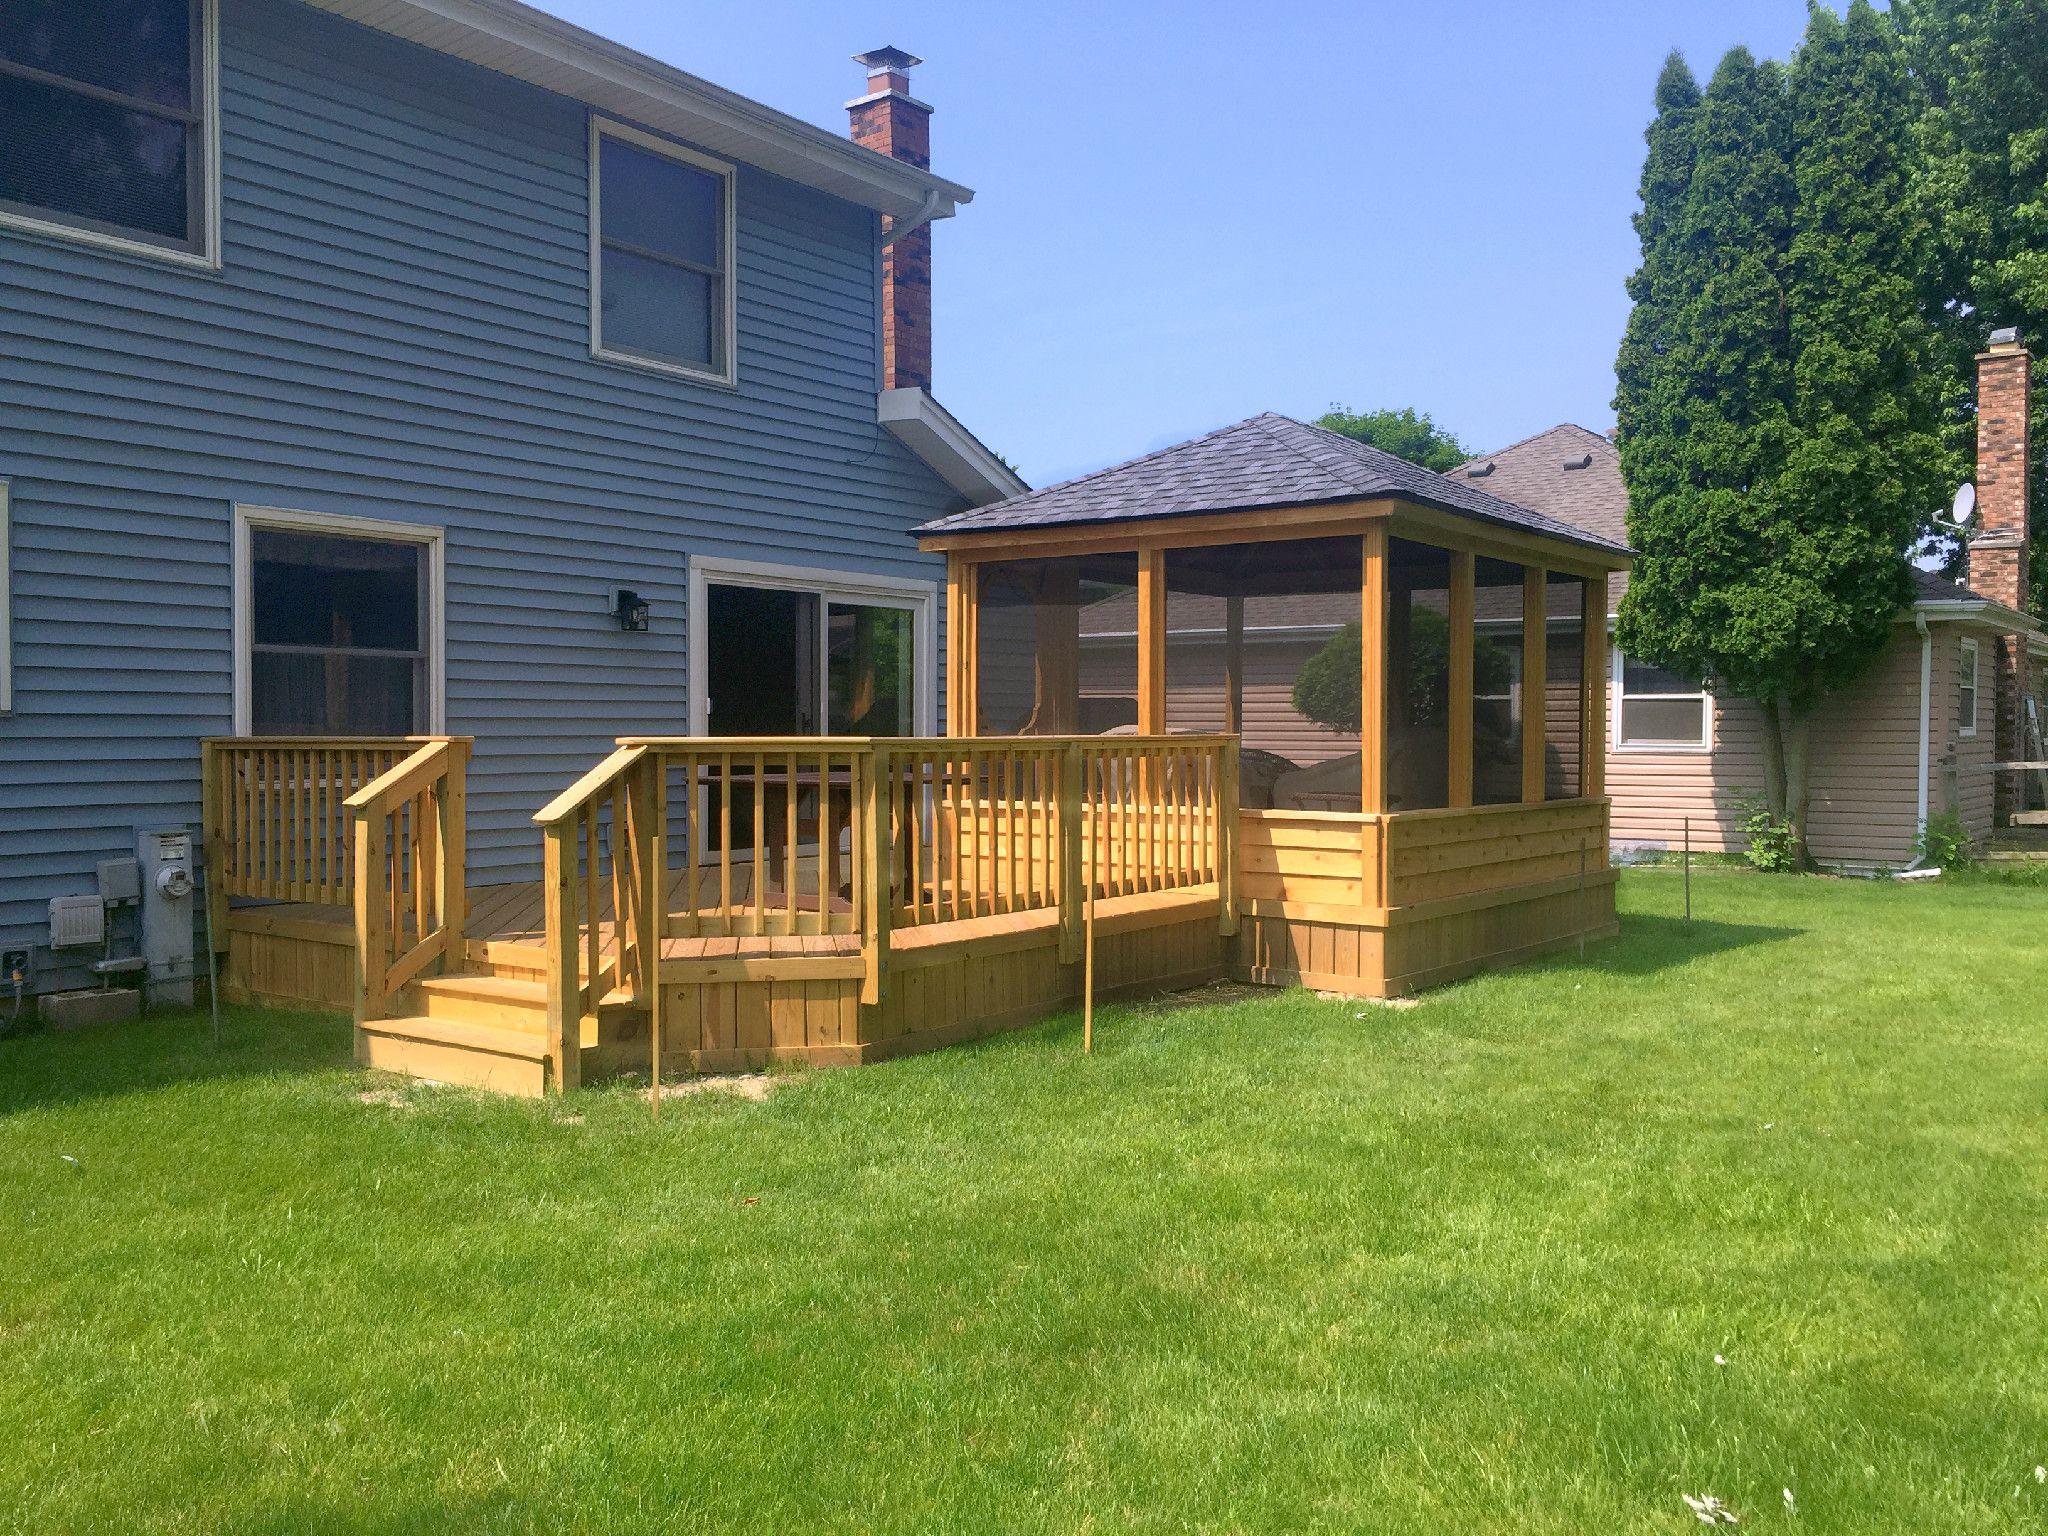 Enclosed Square Gazebo Design Idea With Wood Deck Backyard Gazebo Wood Deck Designs Gazebo Plans